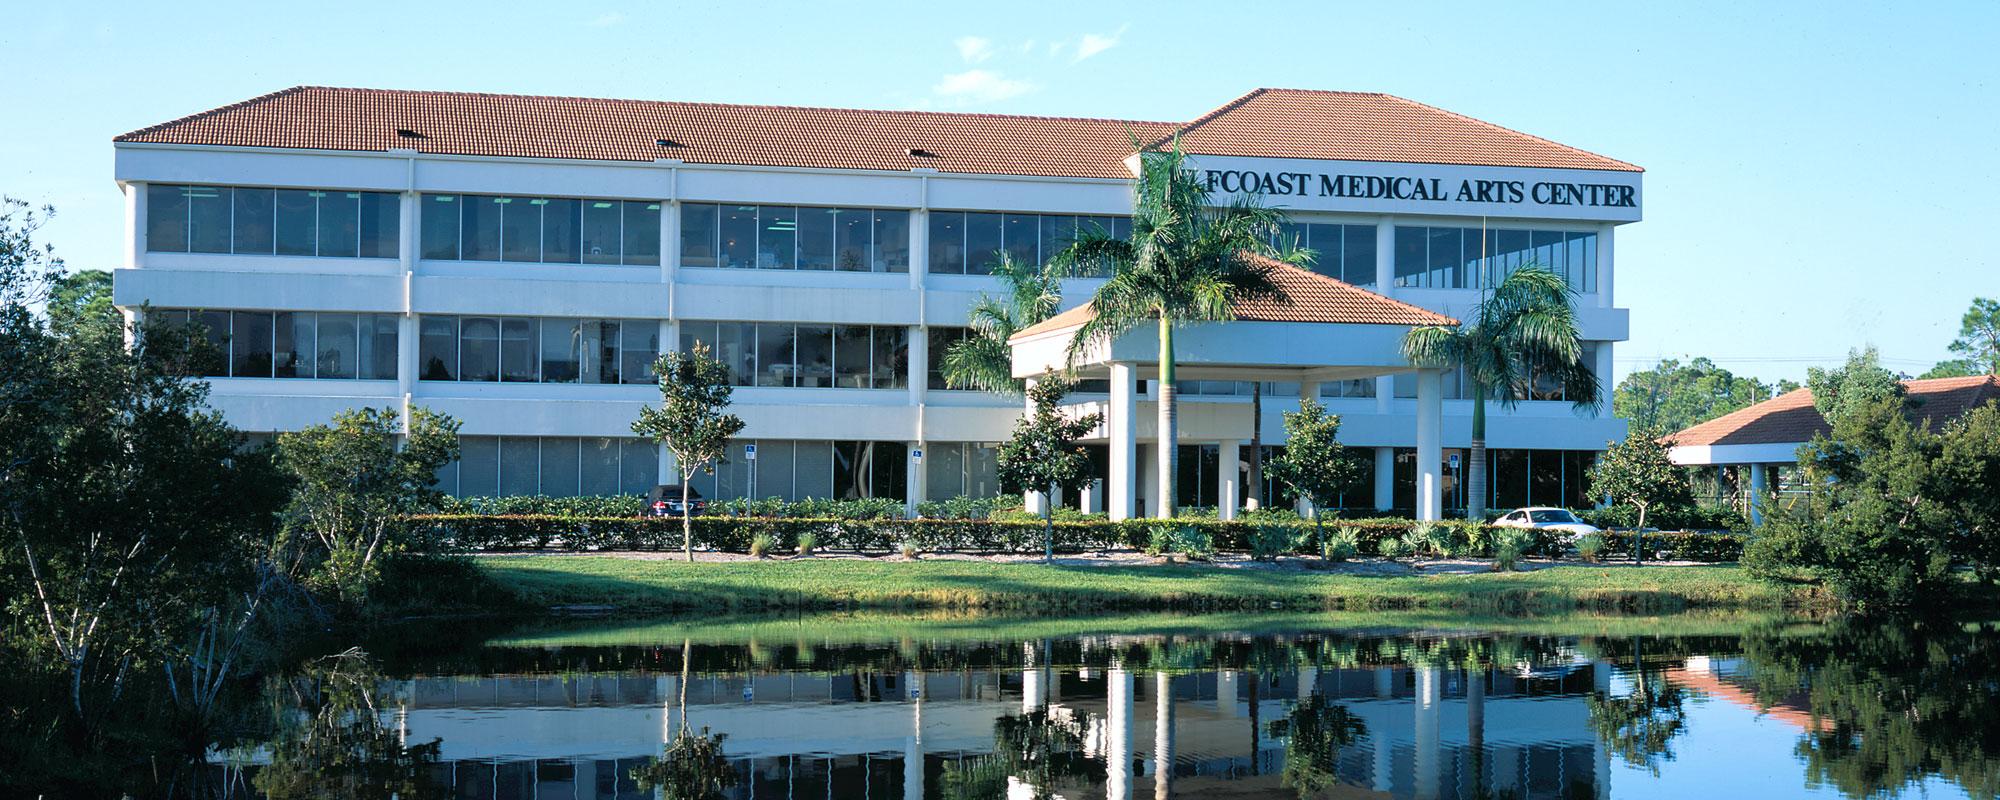 Gulfcoast Medical Arts Center – Naples